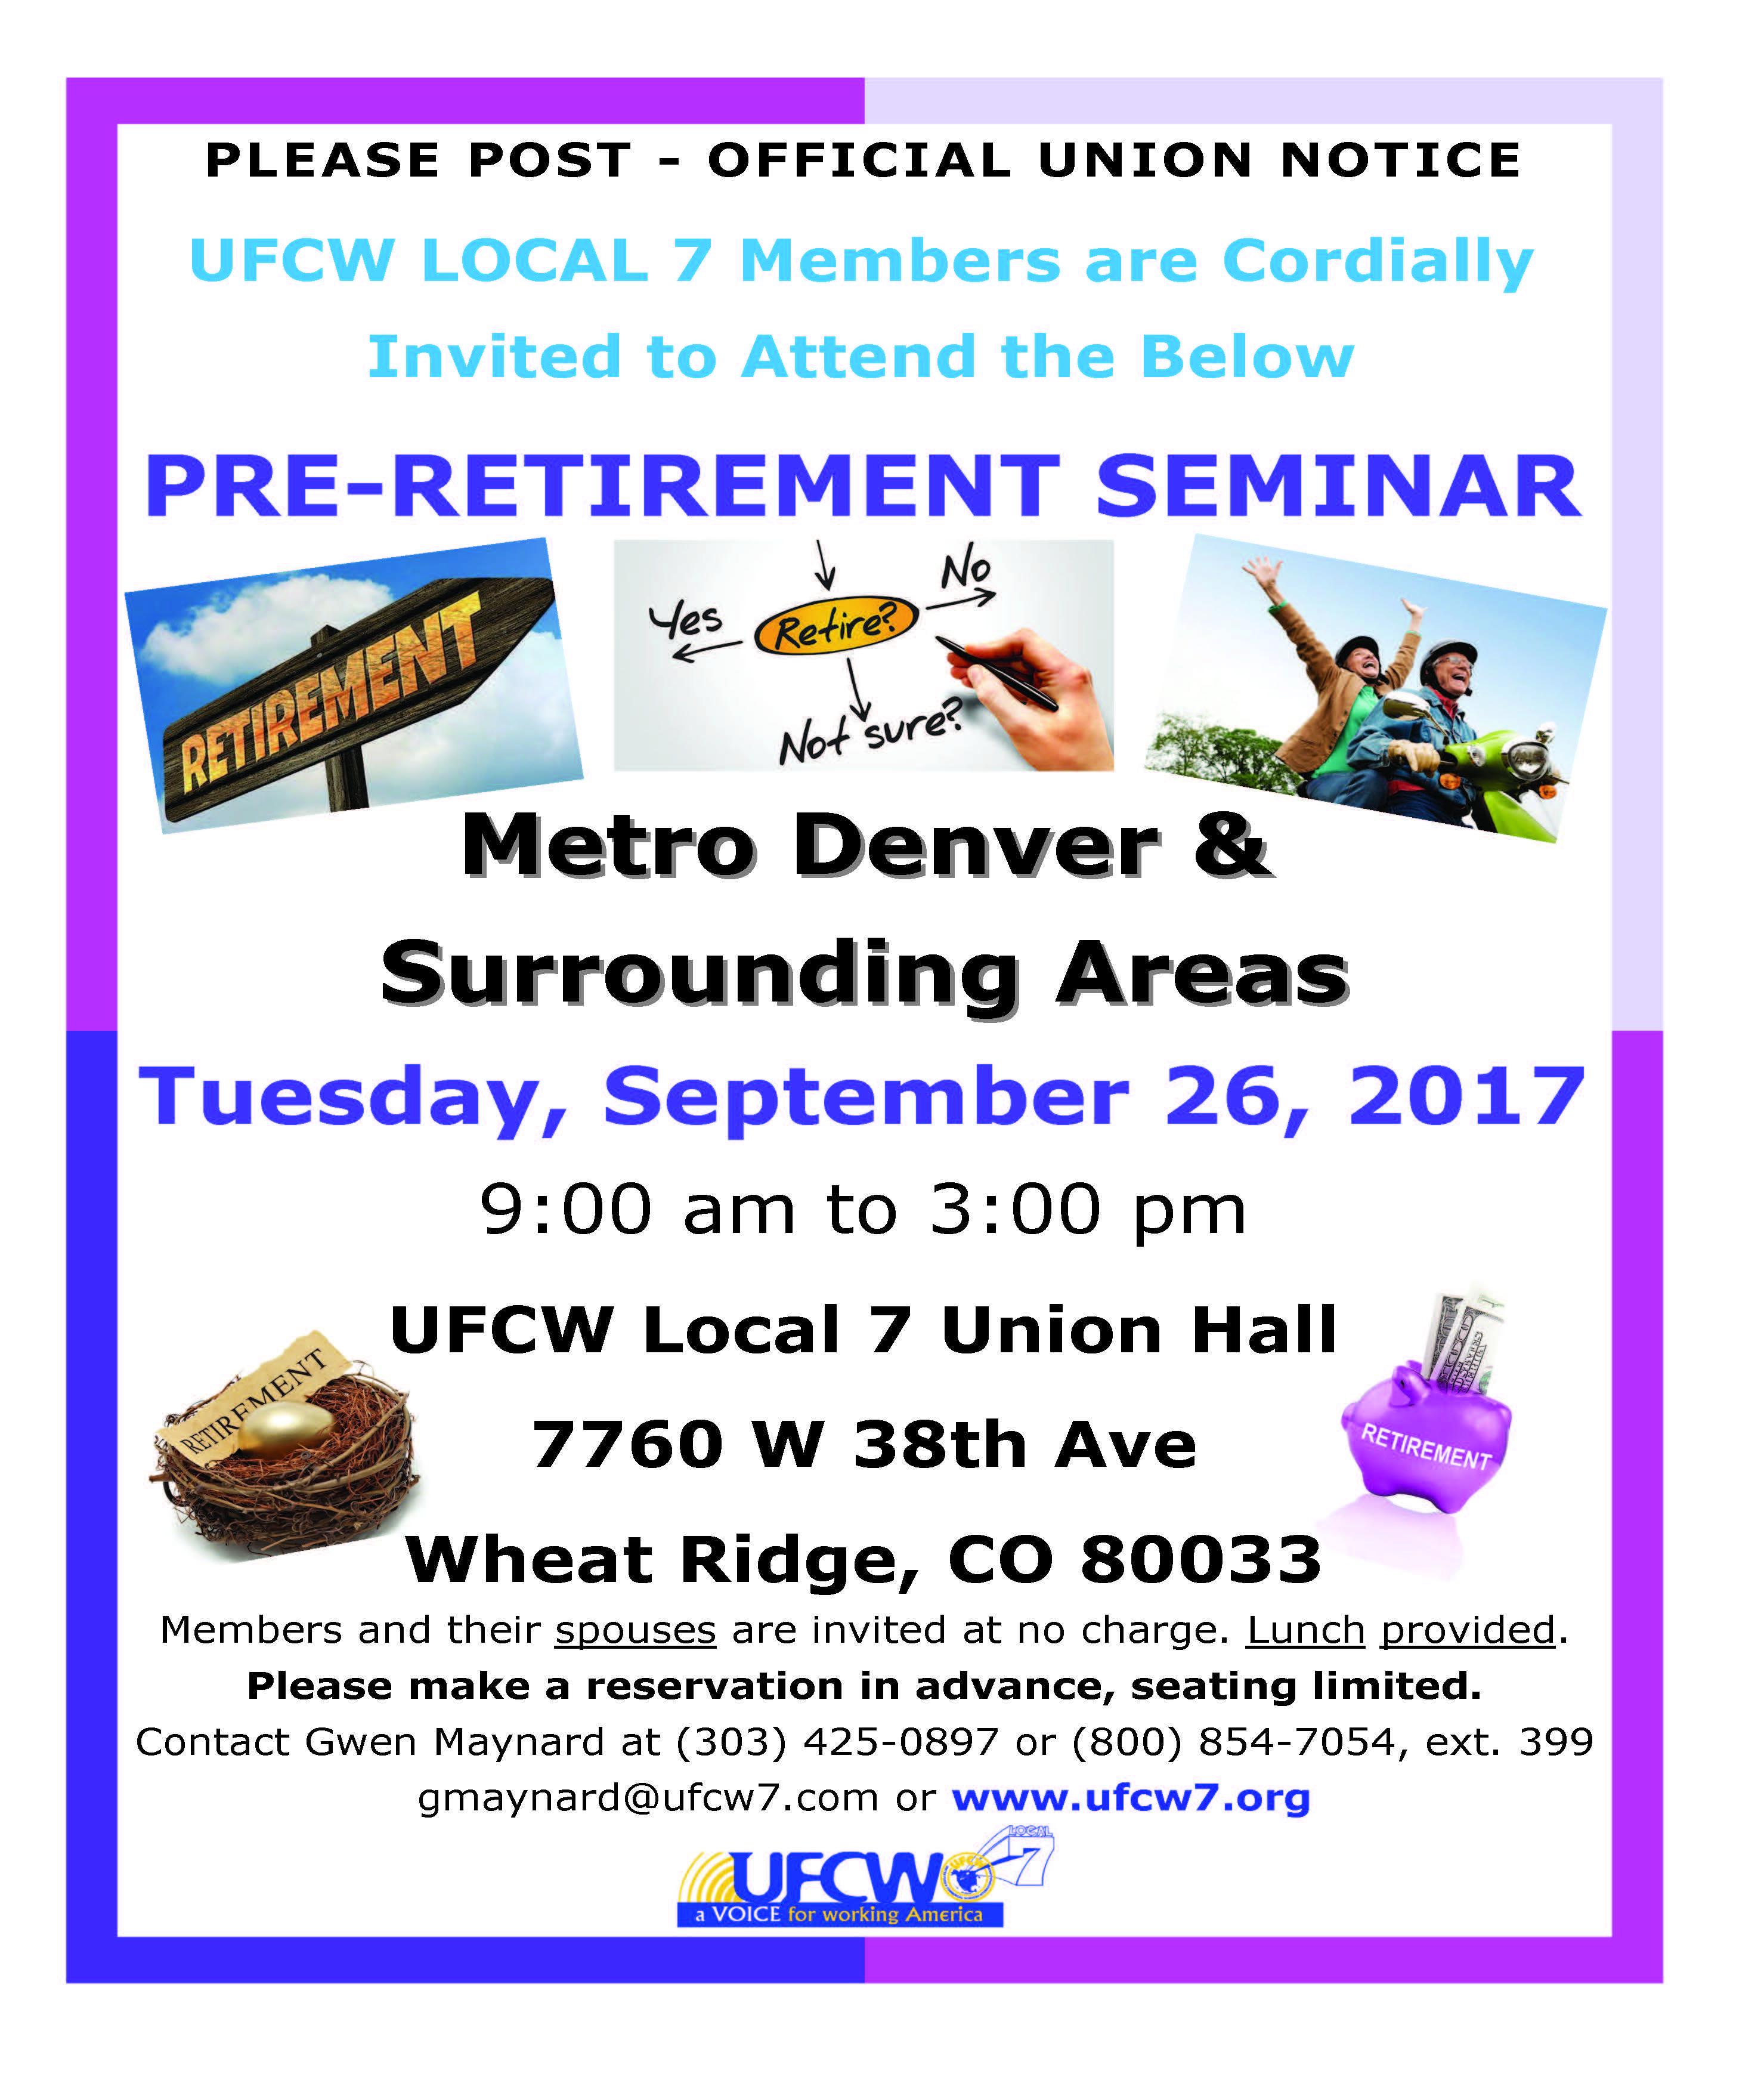 Metro Denver Pre-Retirement Seminar